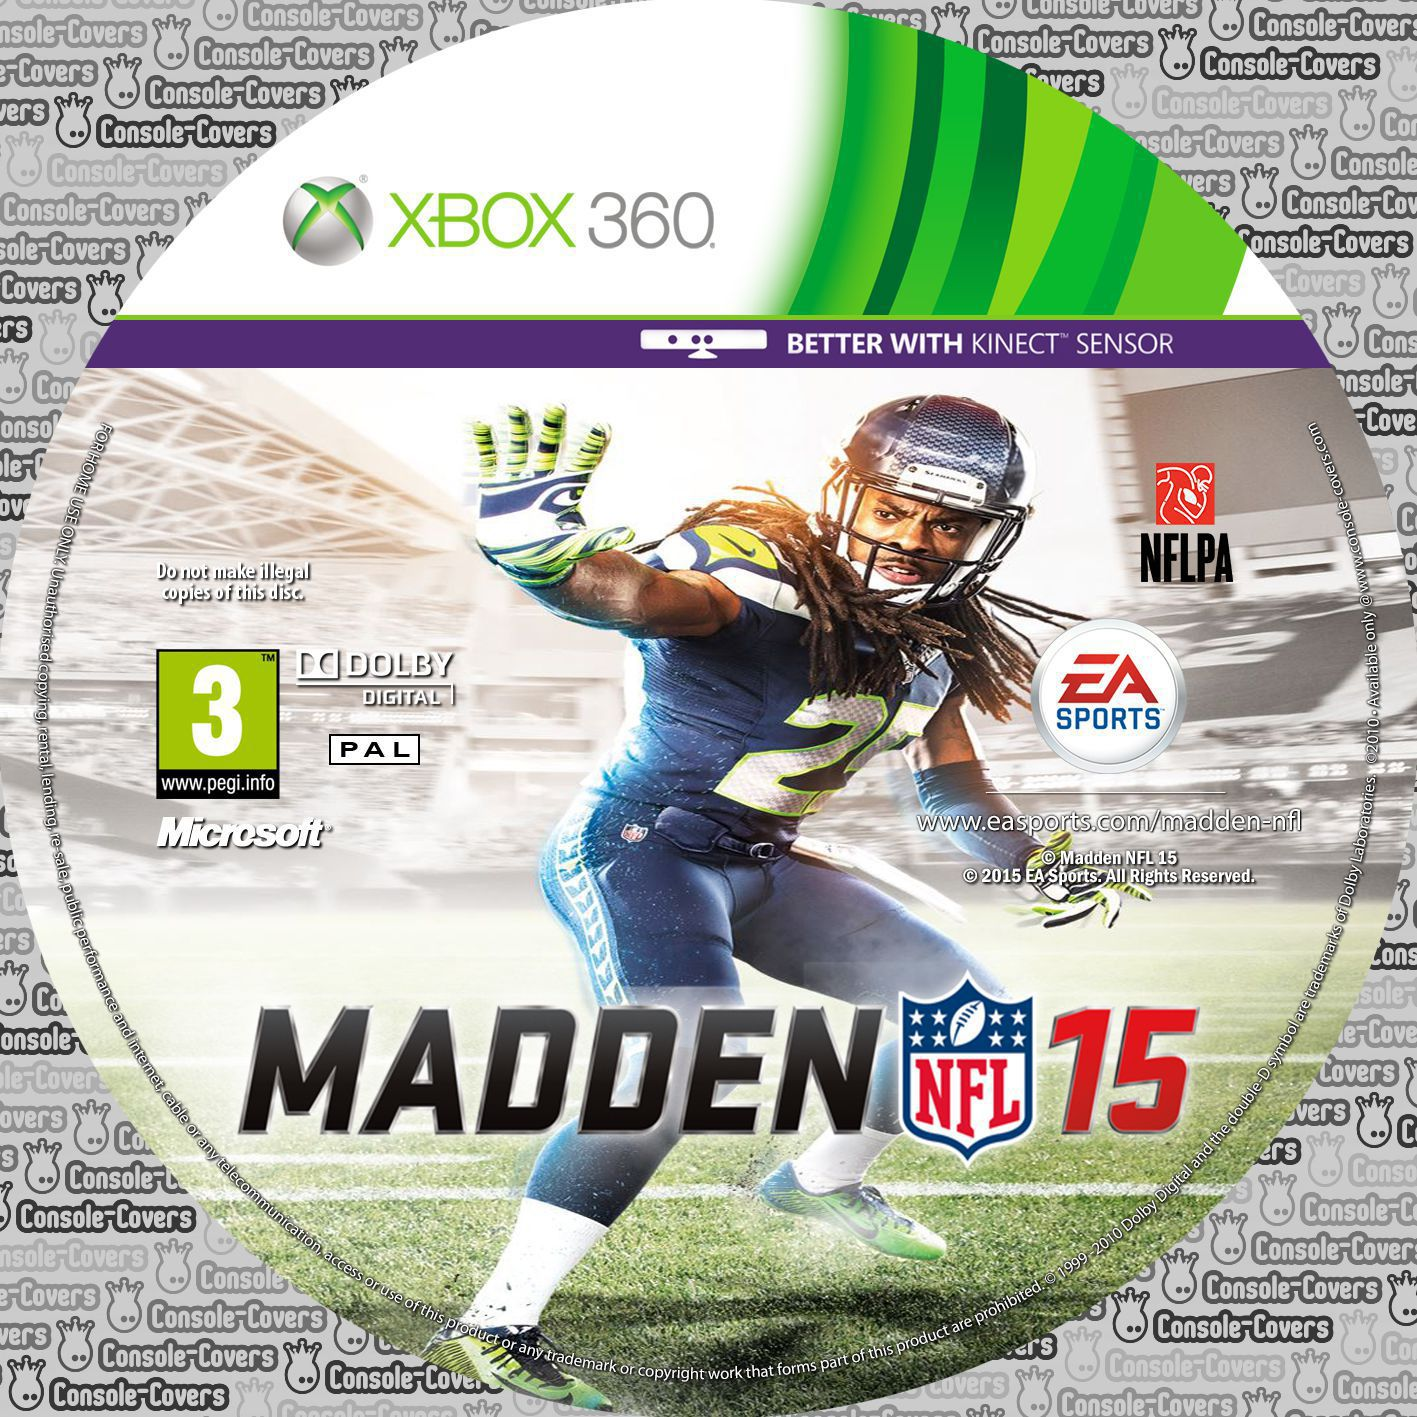 Label Madden NFL 15 Xbox 360